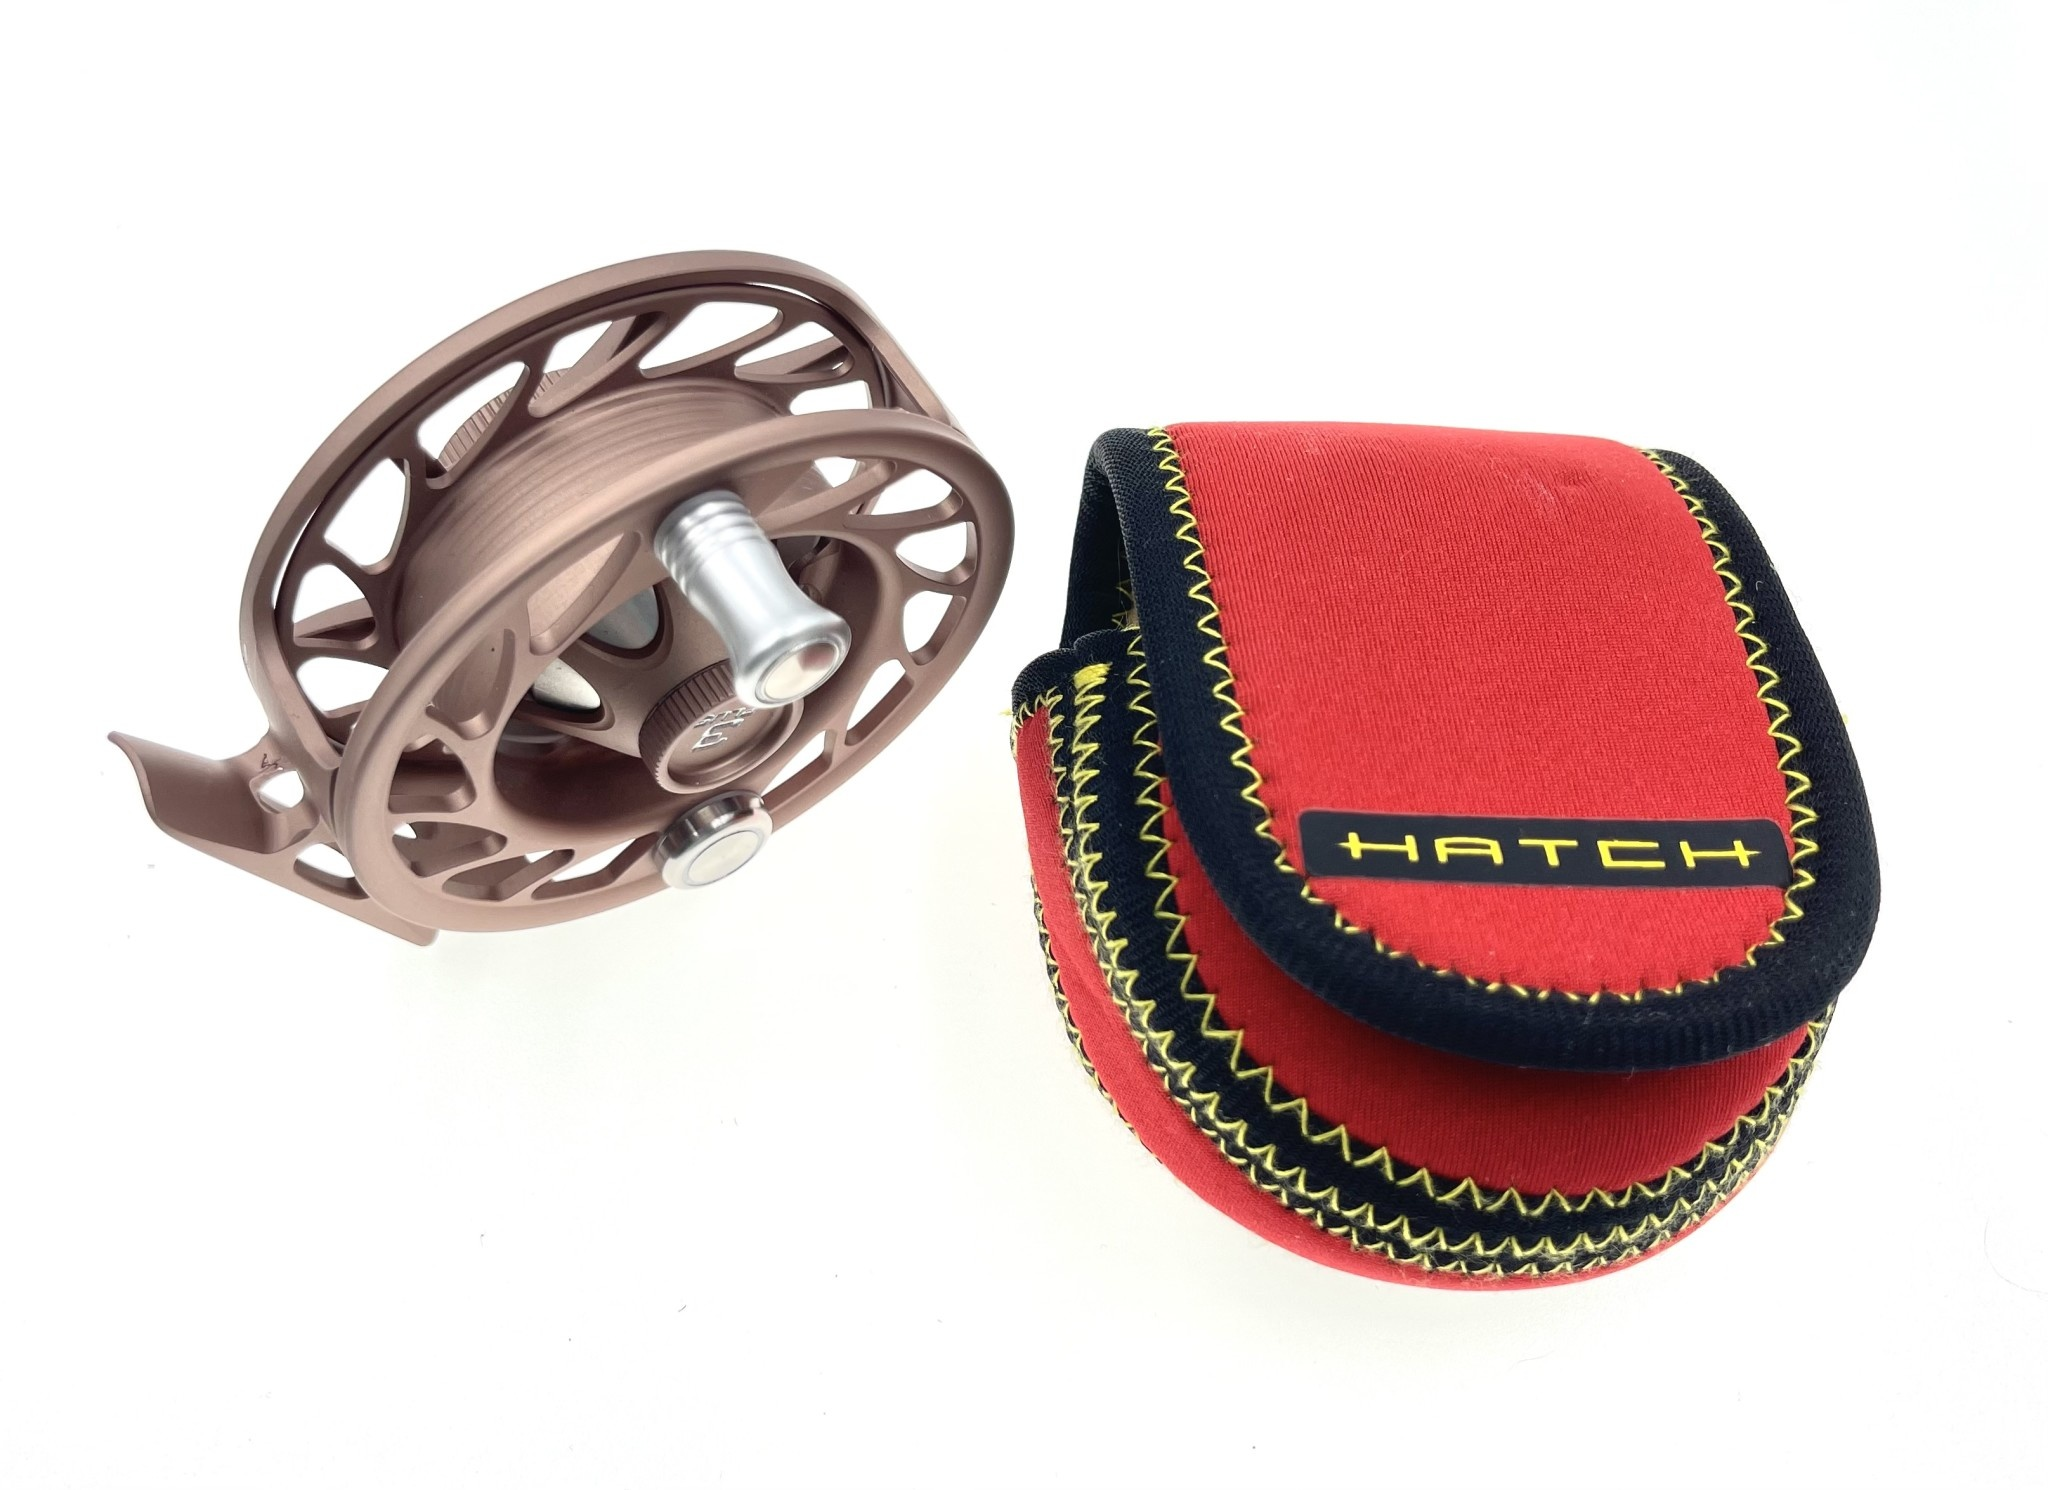 Hatch Custom Hatch Finatic Reel - 3 Plus Rose